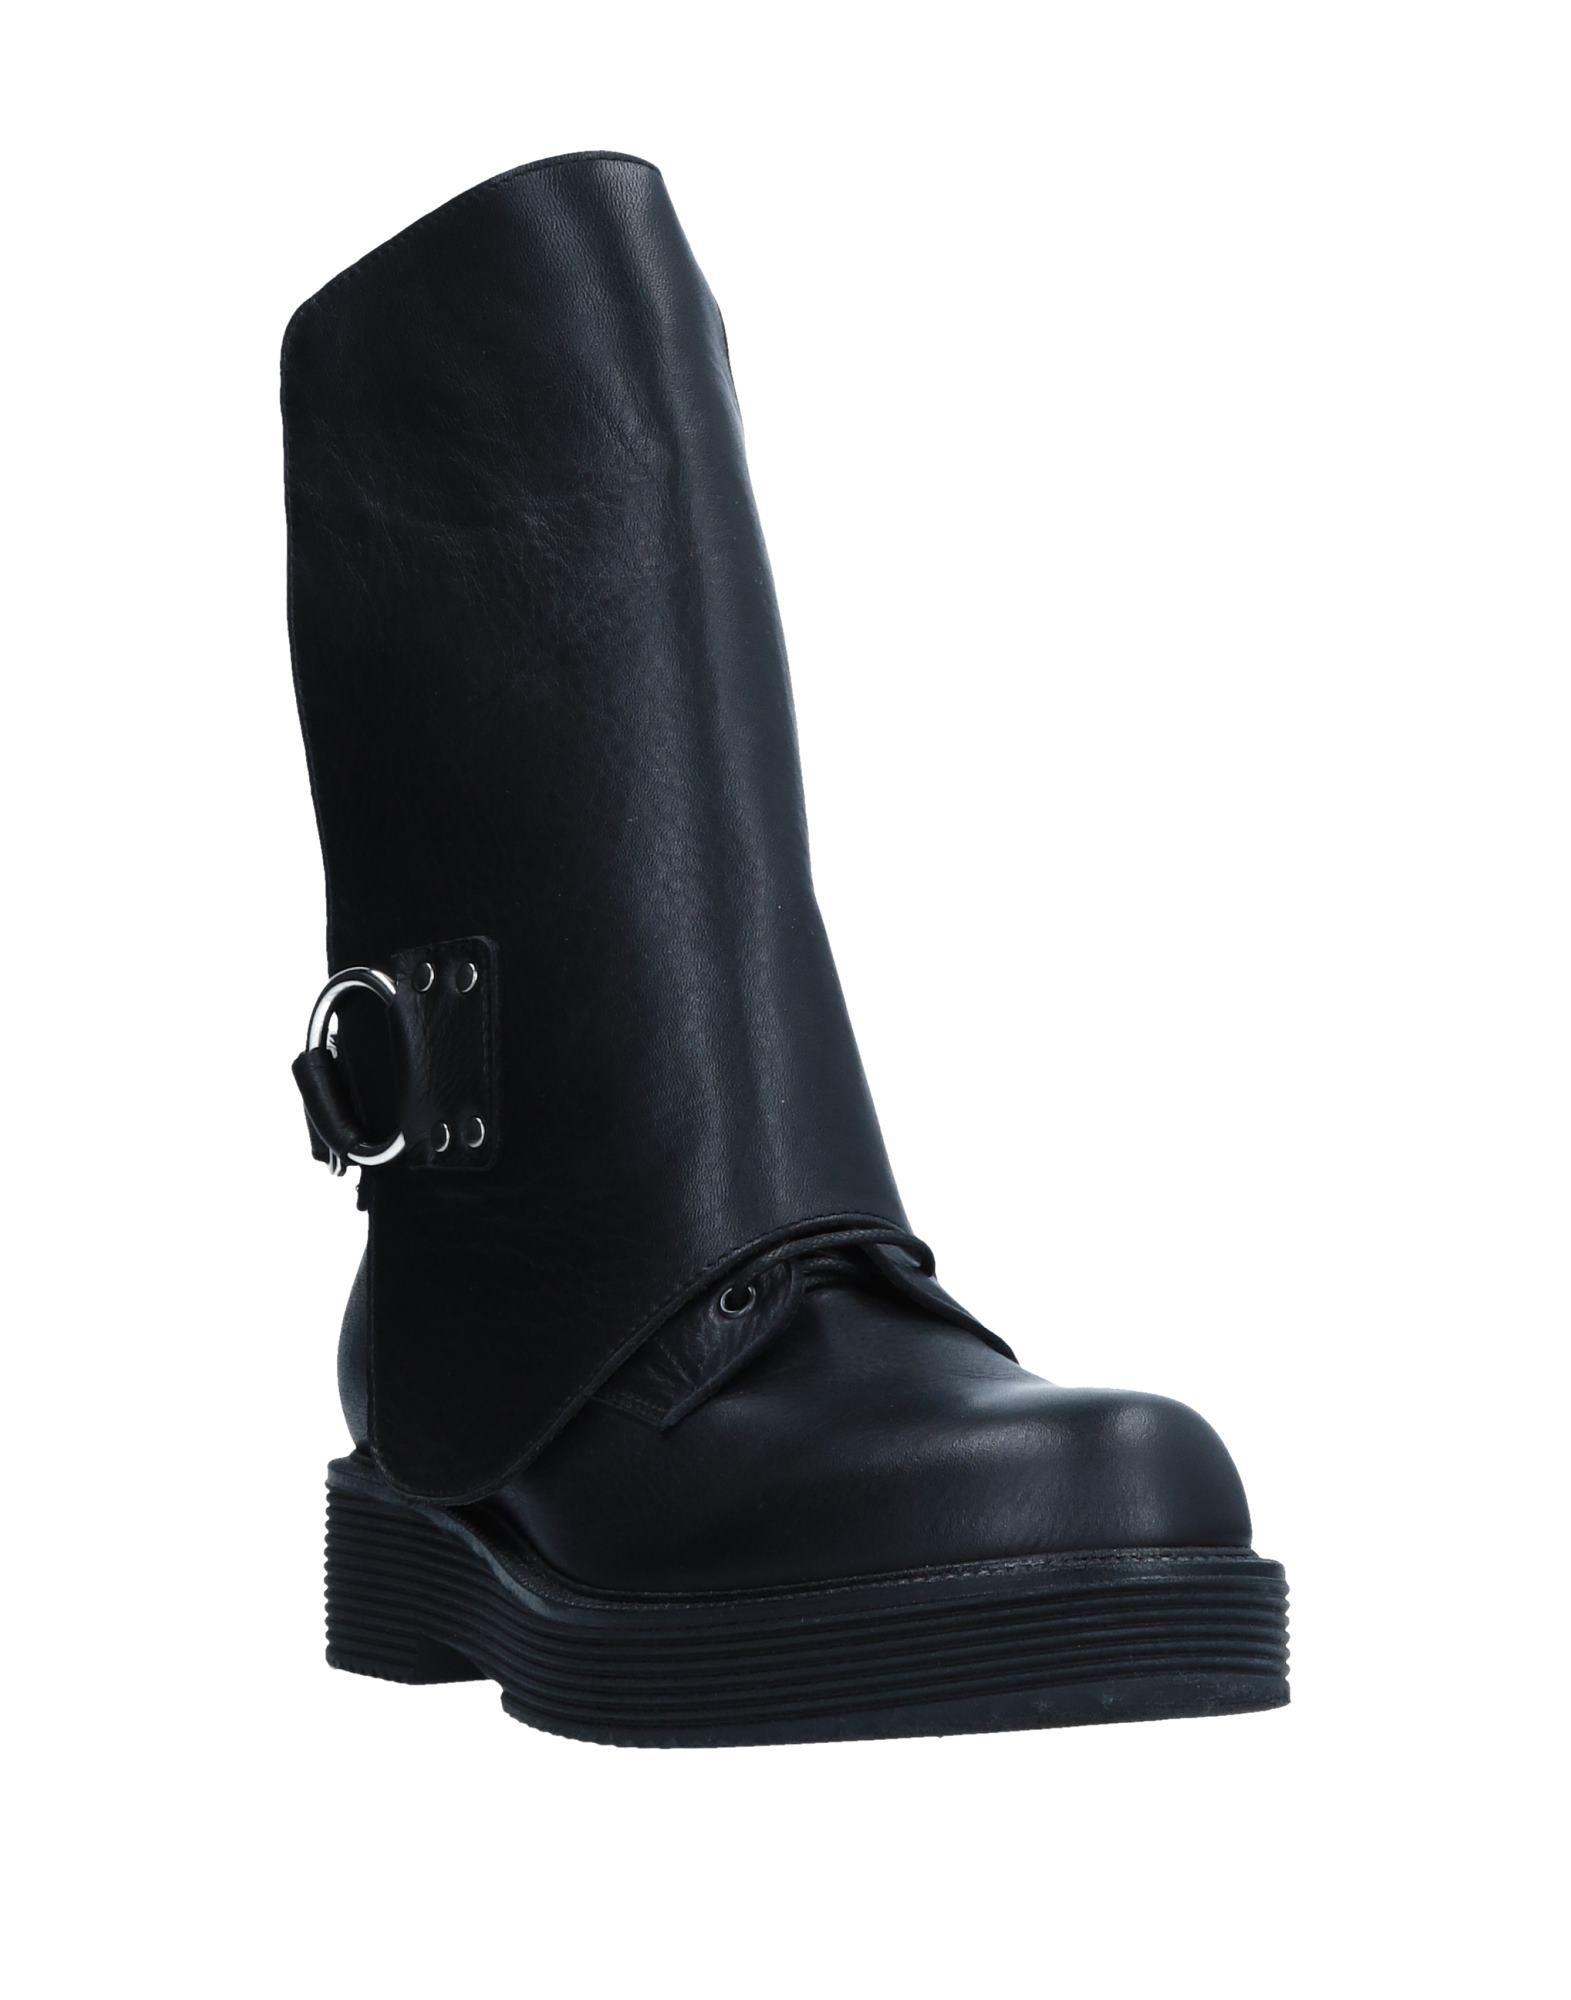 Piampiani Stiefelette Gute Damen  11546441UU Gute Stiefelette Qualität beliebte Schuhe 3f9445